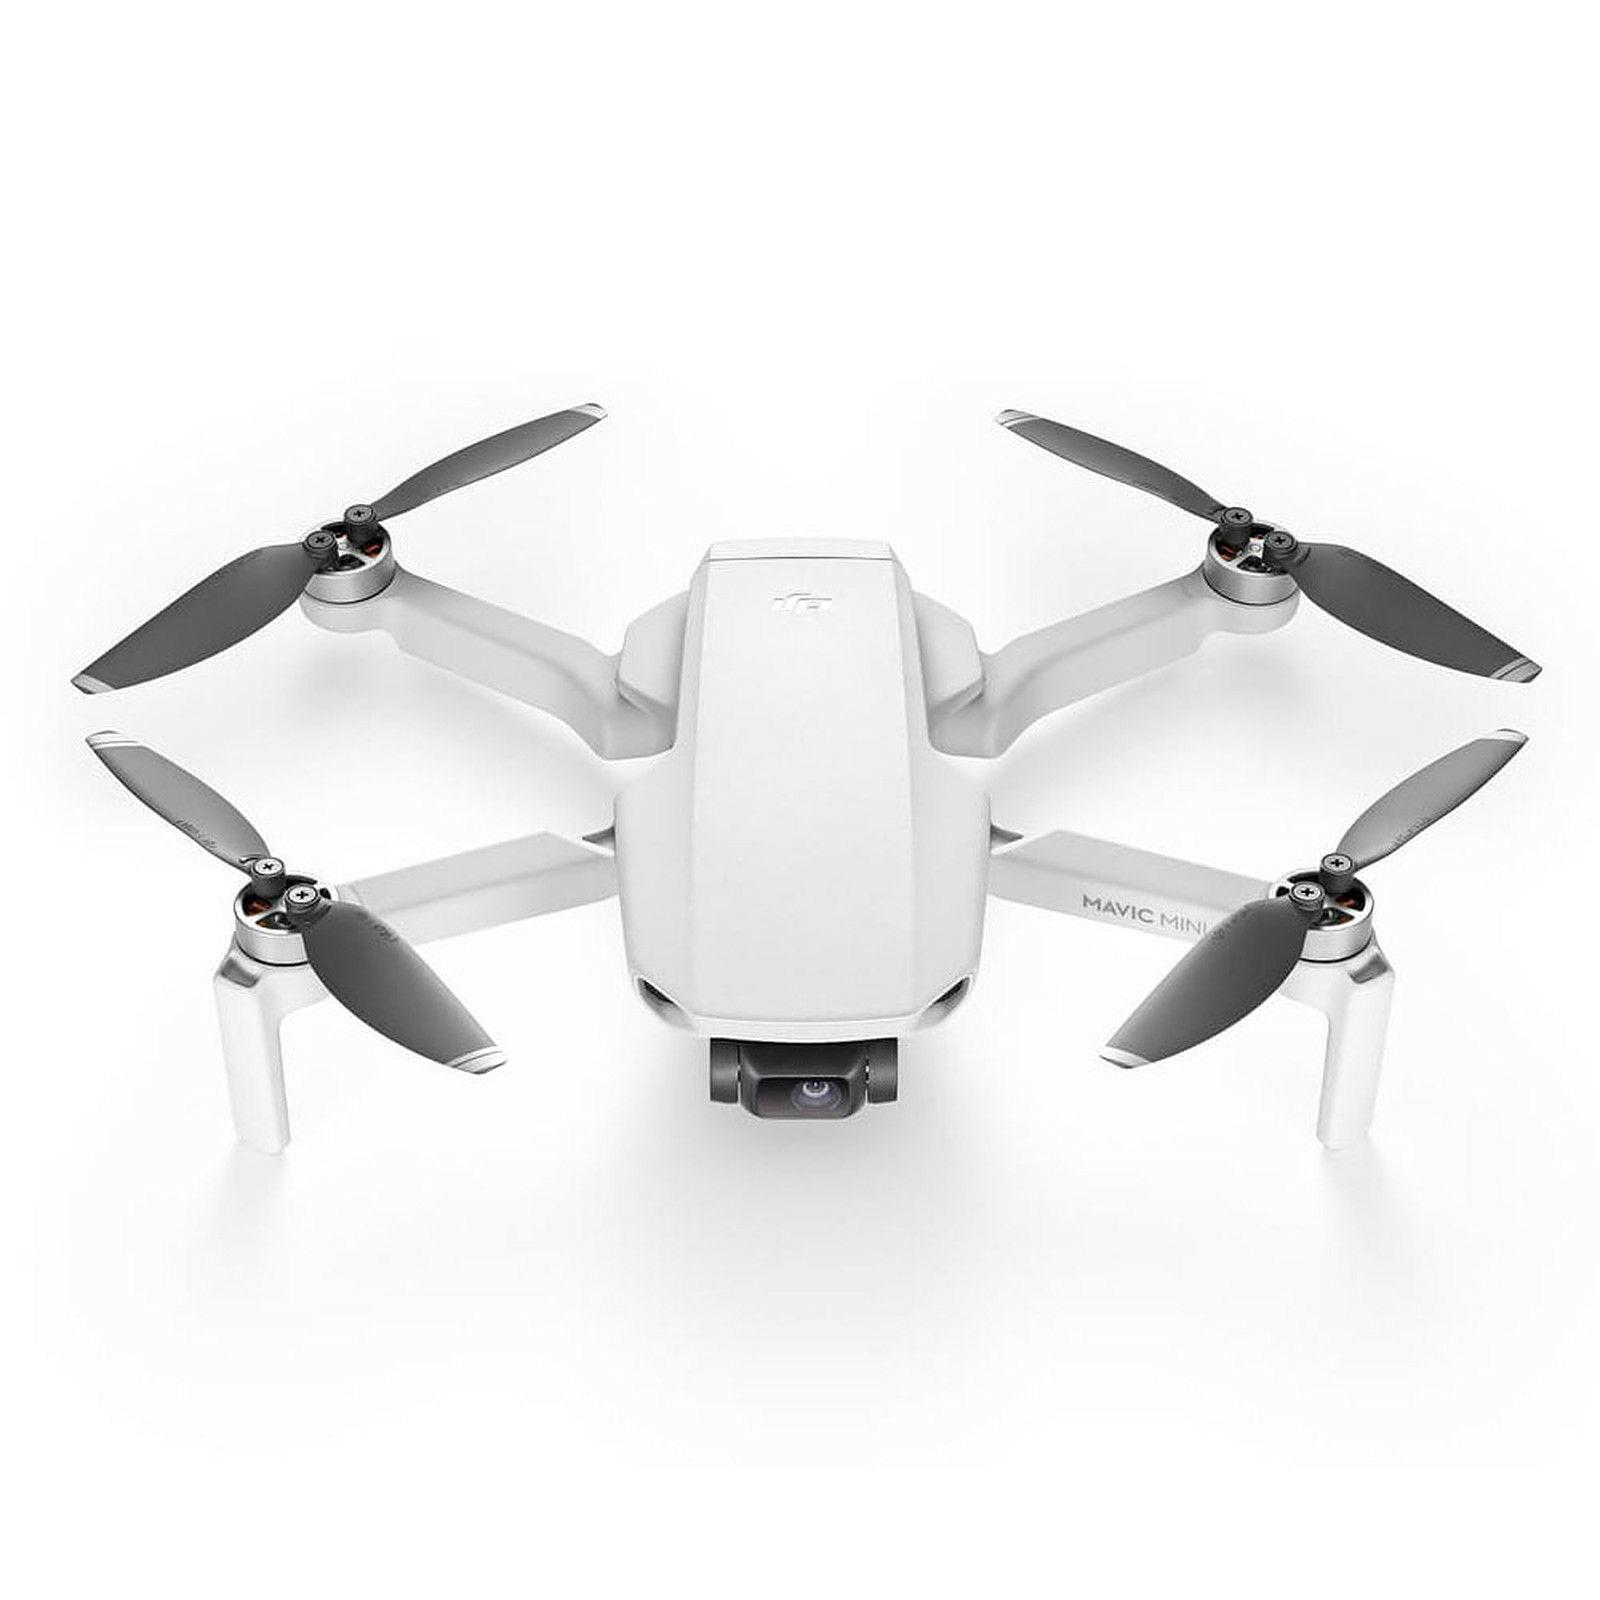 DJI Mavic Mini: Drohne (30m Flugzeit, 2.7K Video, 2km Reichweite) | Fly More Combo für 435,60€